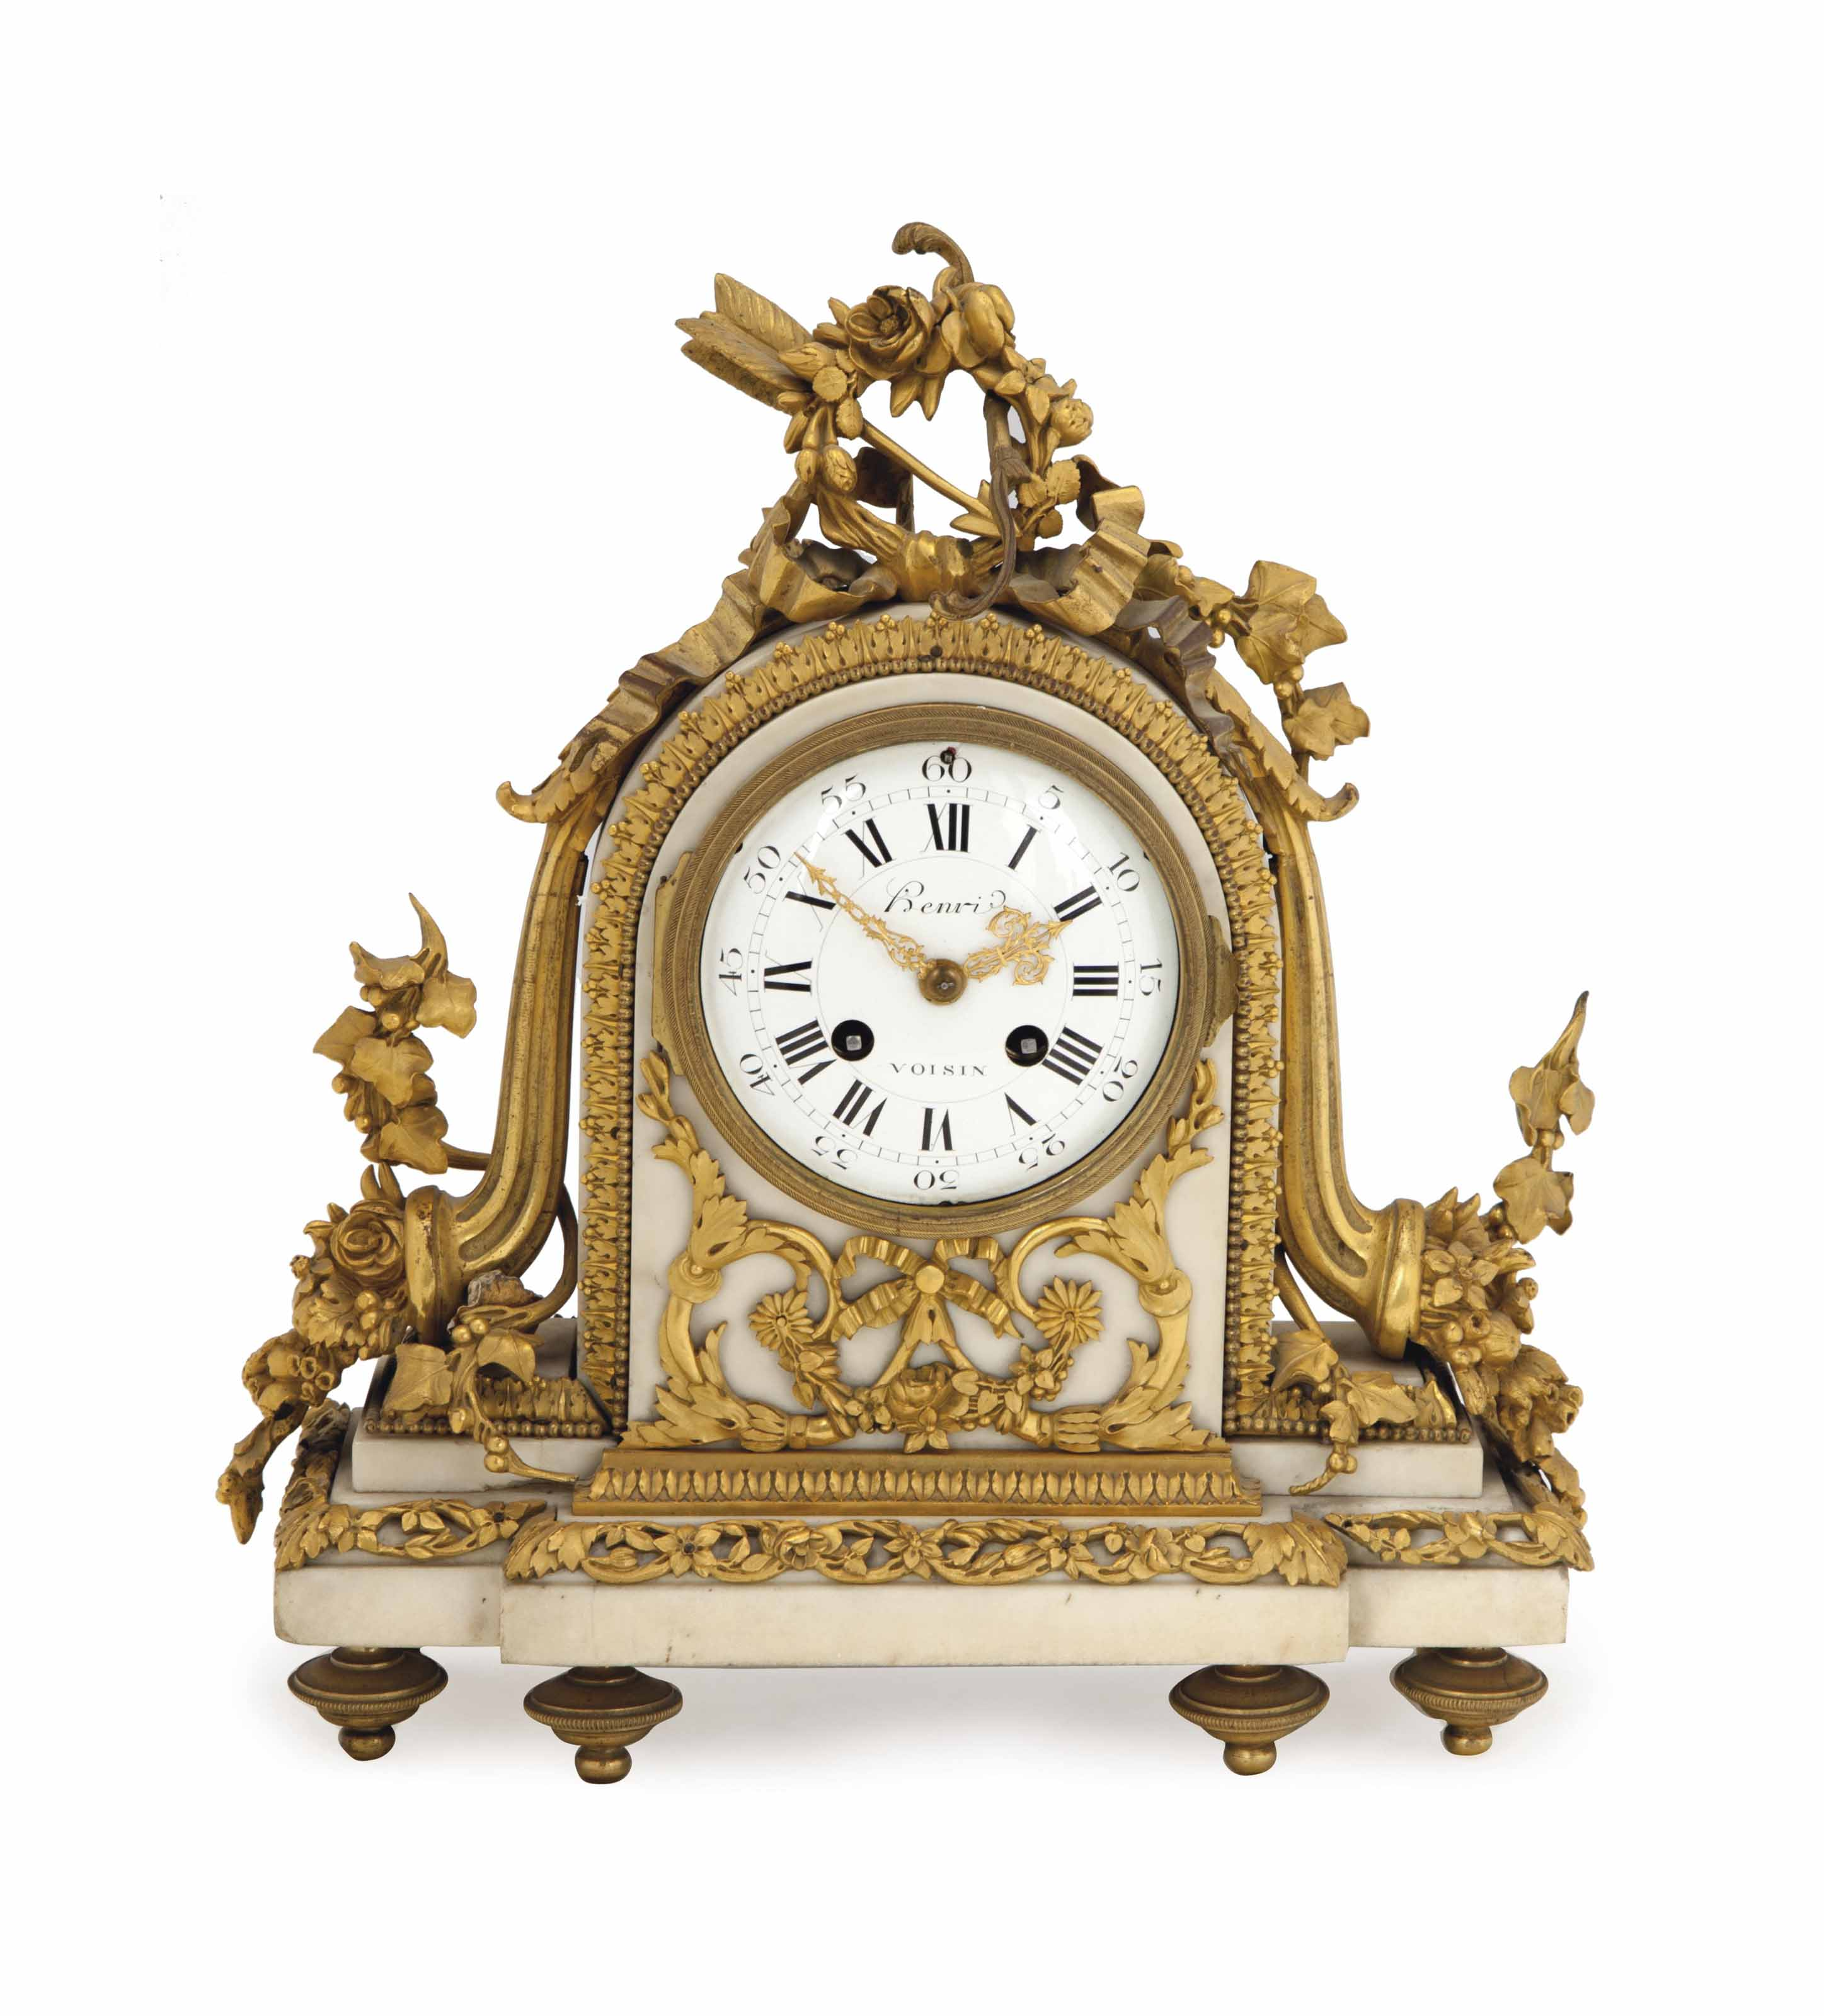 A LOUIS XVI WHITE MARBLE AND GILT BRONZE MANTEL CLOCK,